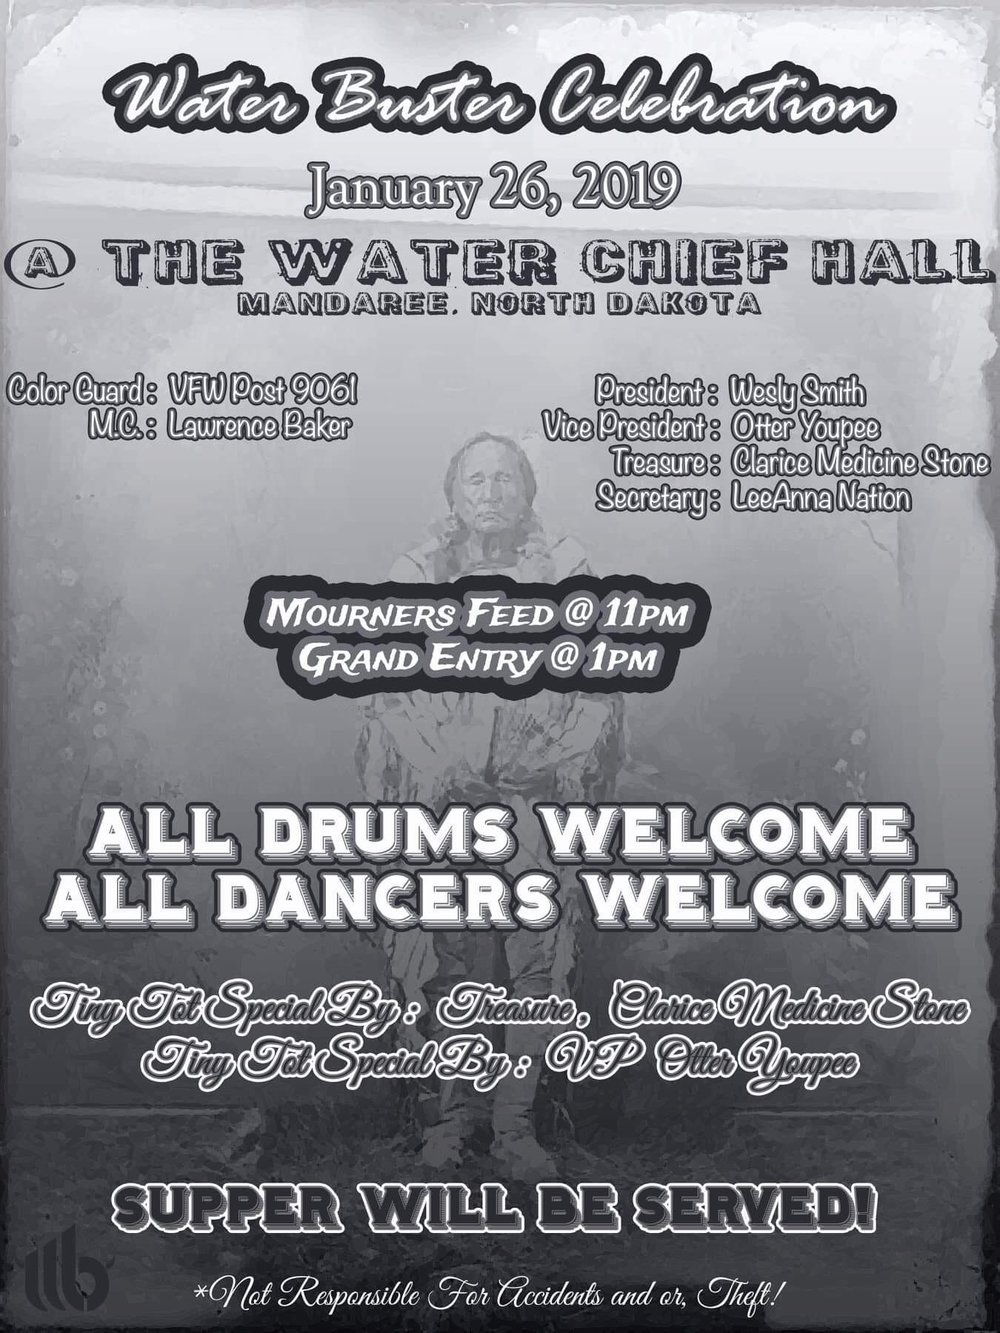 Water Buster Celebration January 26 2019 Mandaree.jpg